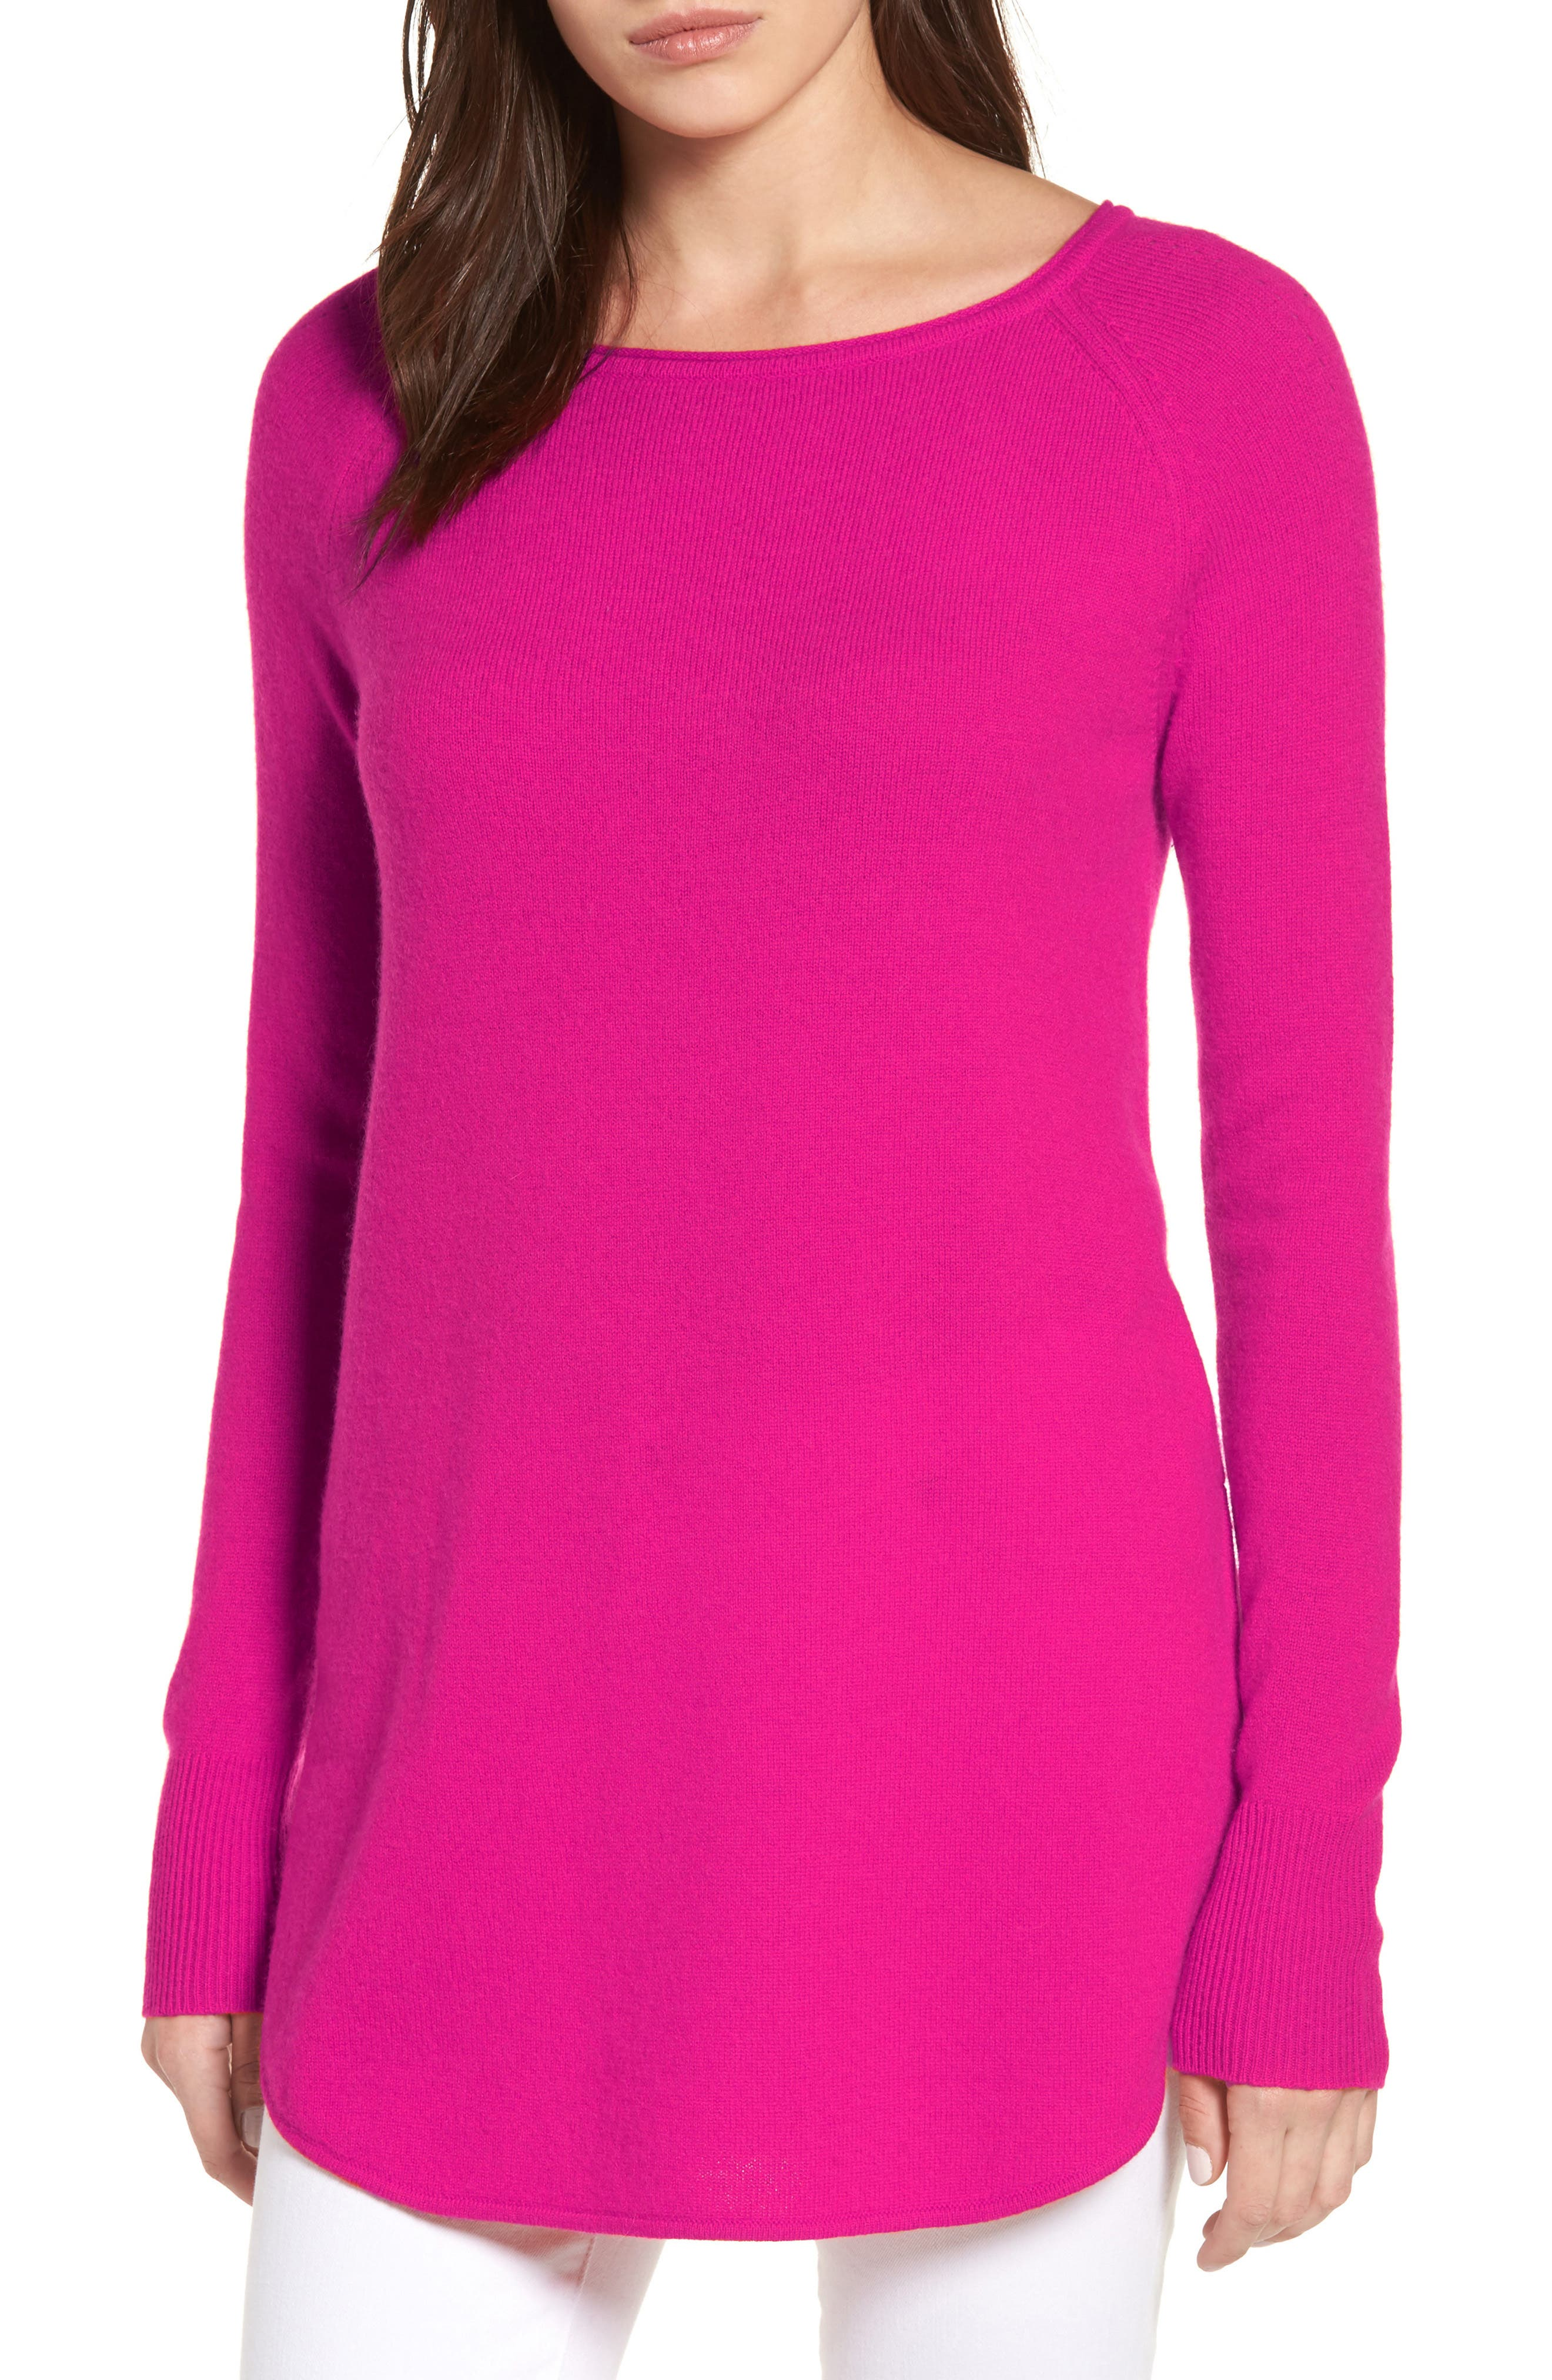 Alternate Image 1 Selected - Halogen® Shirttail Wool & Cashmere Boatneck Tunic (Regular & Petite)